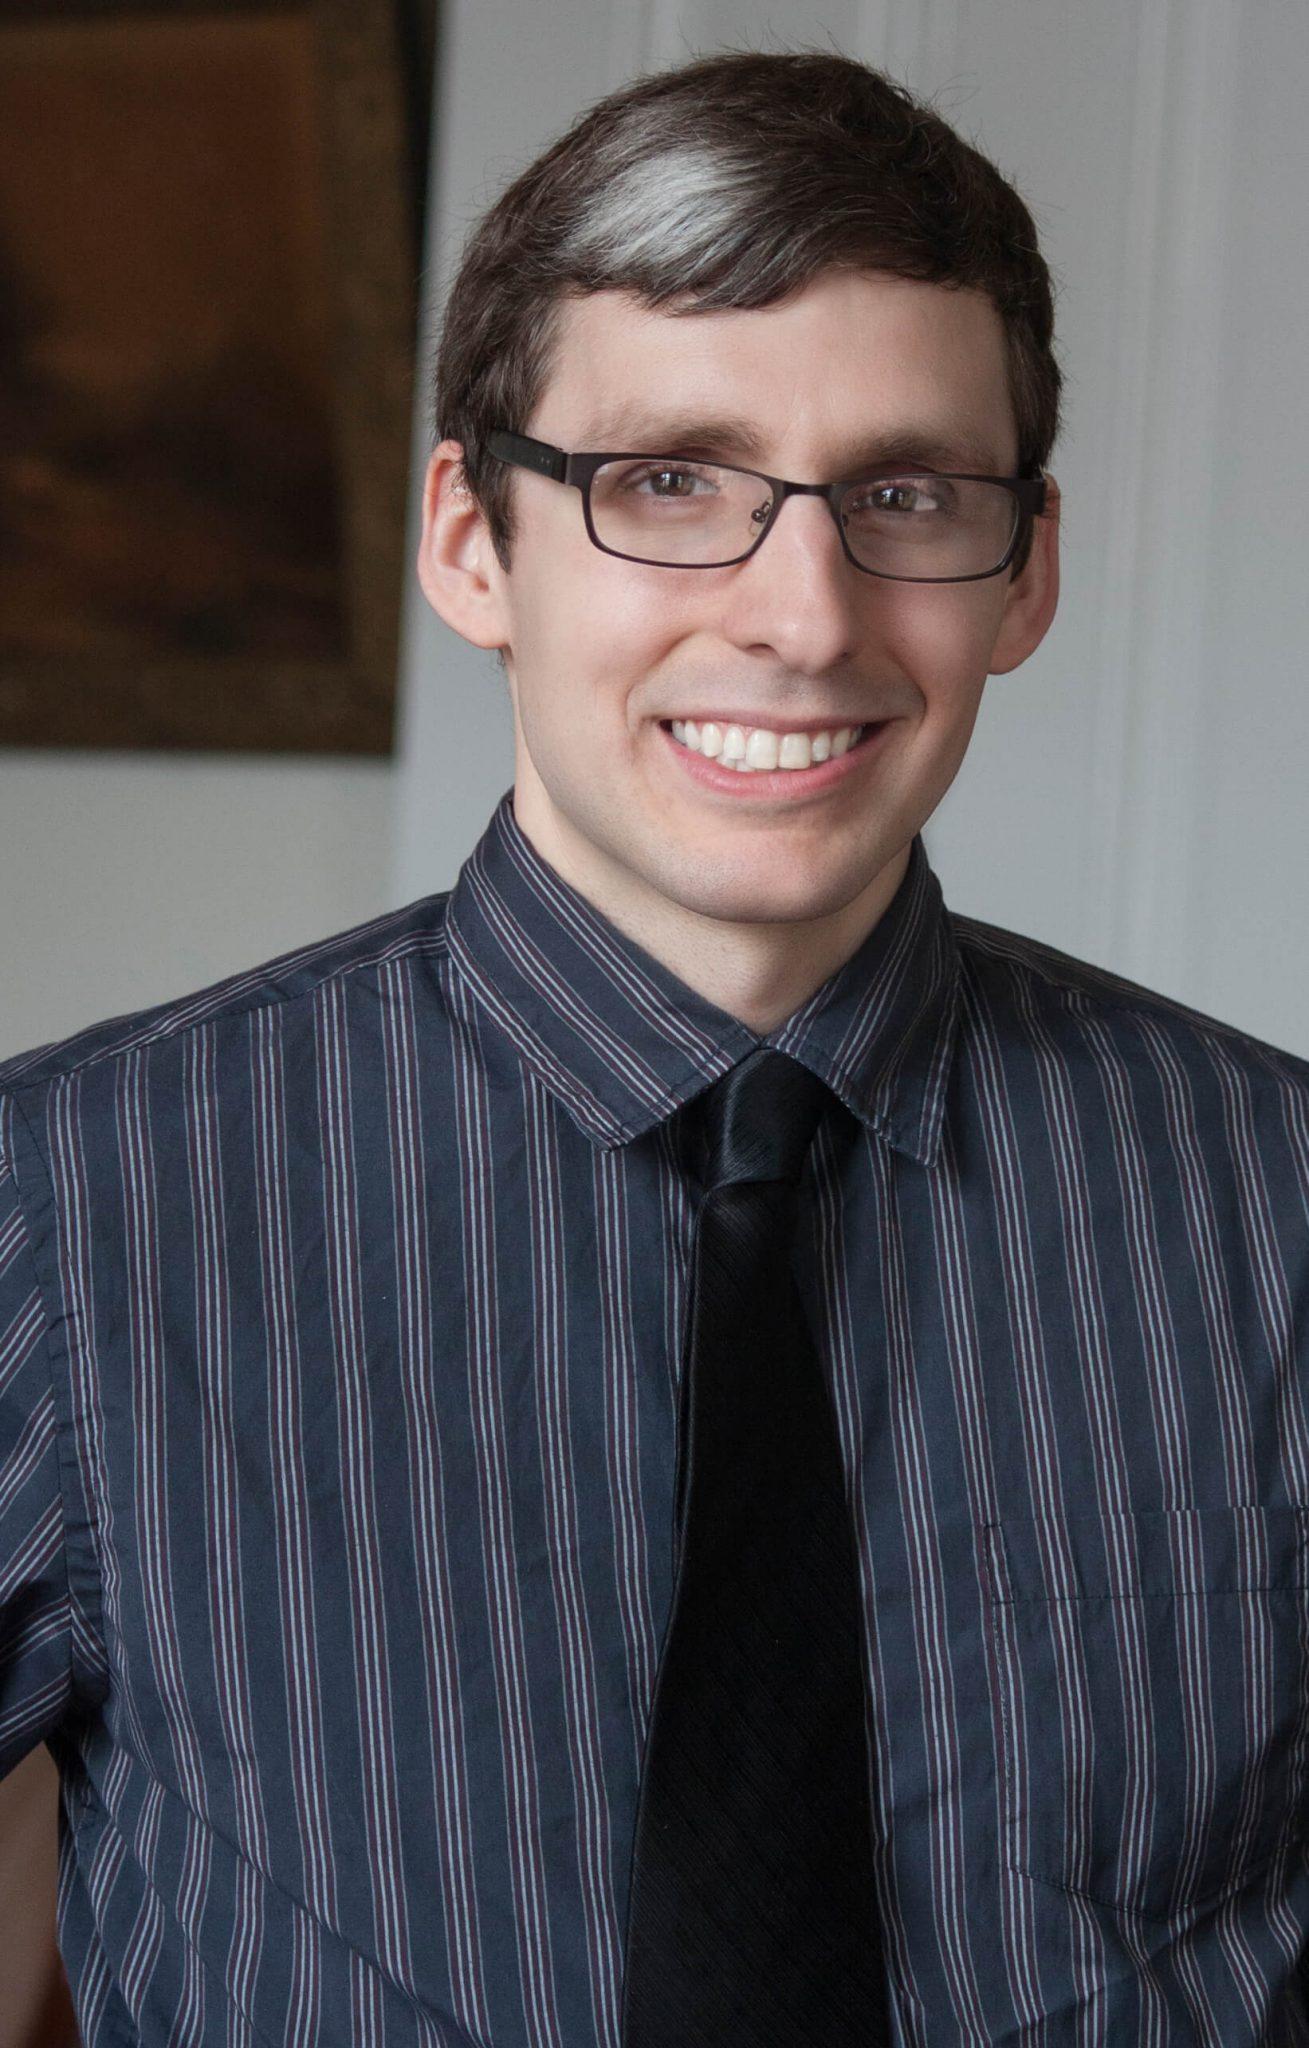 Nathan Fuller